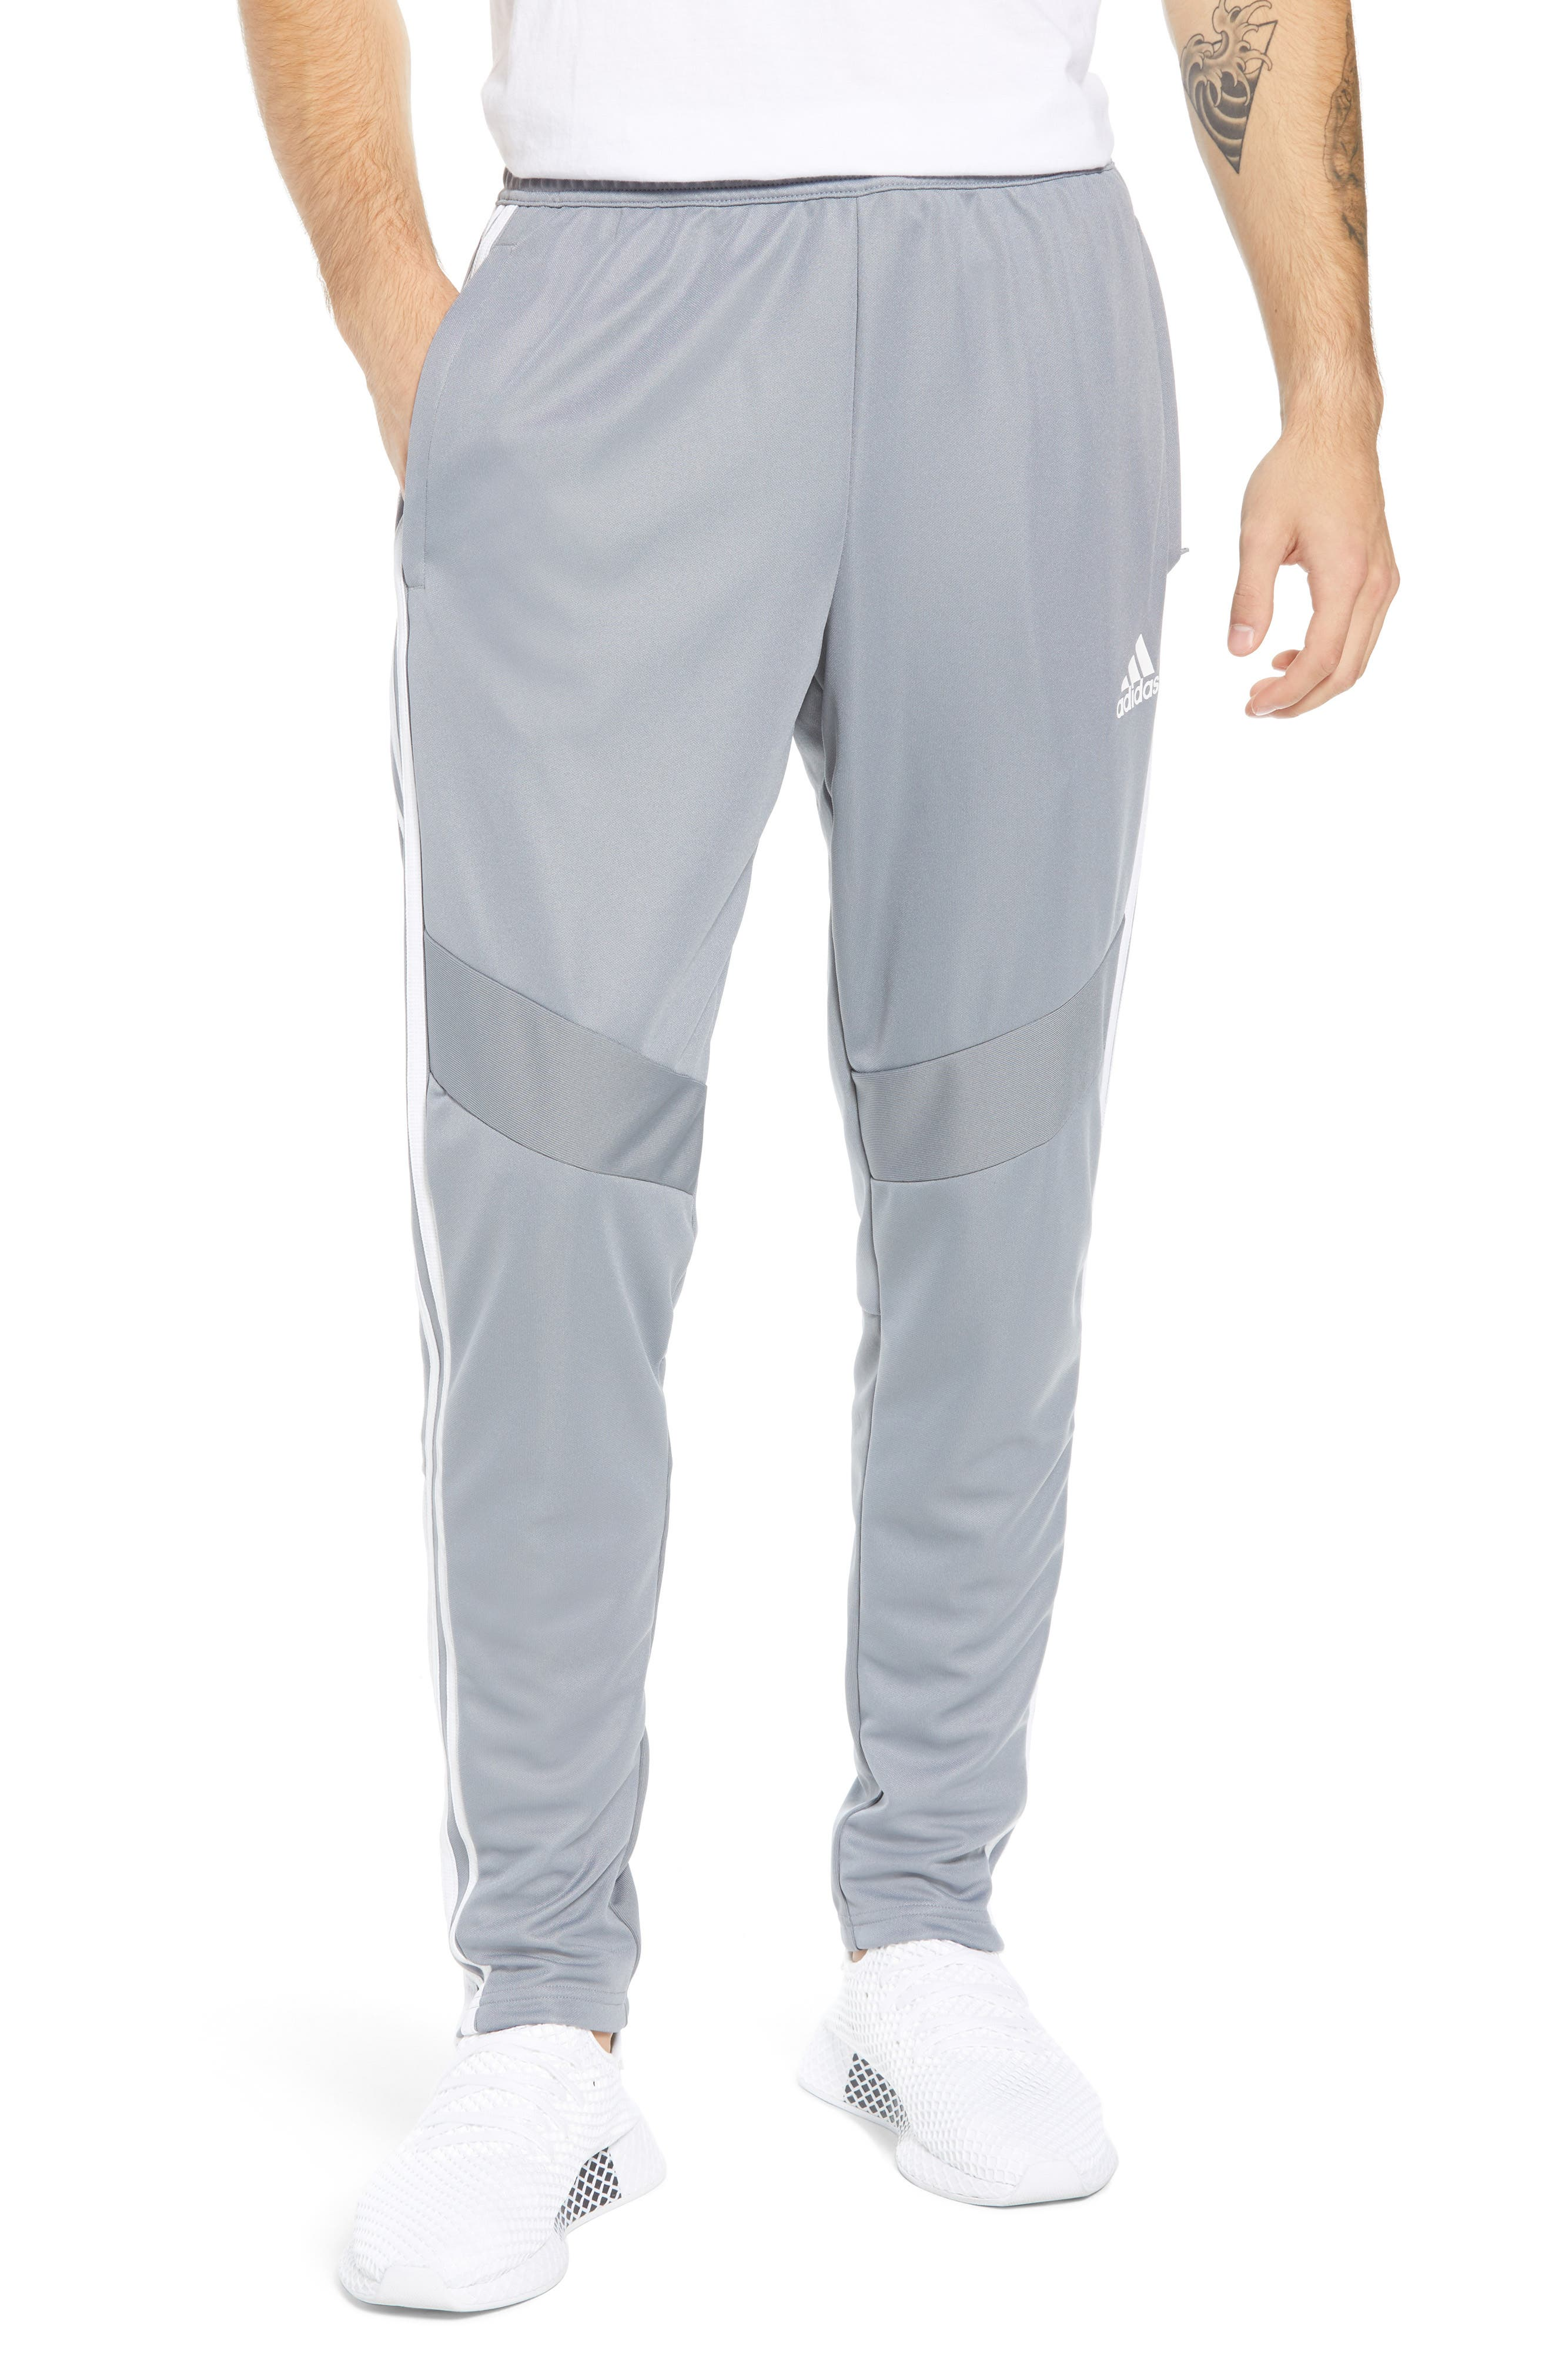 Men's Adidas Tiro Soccer Training Pants